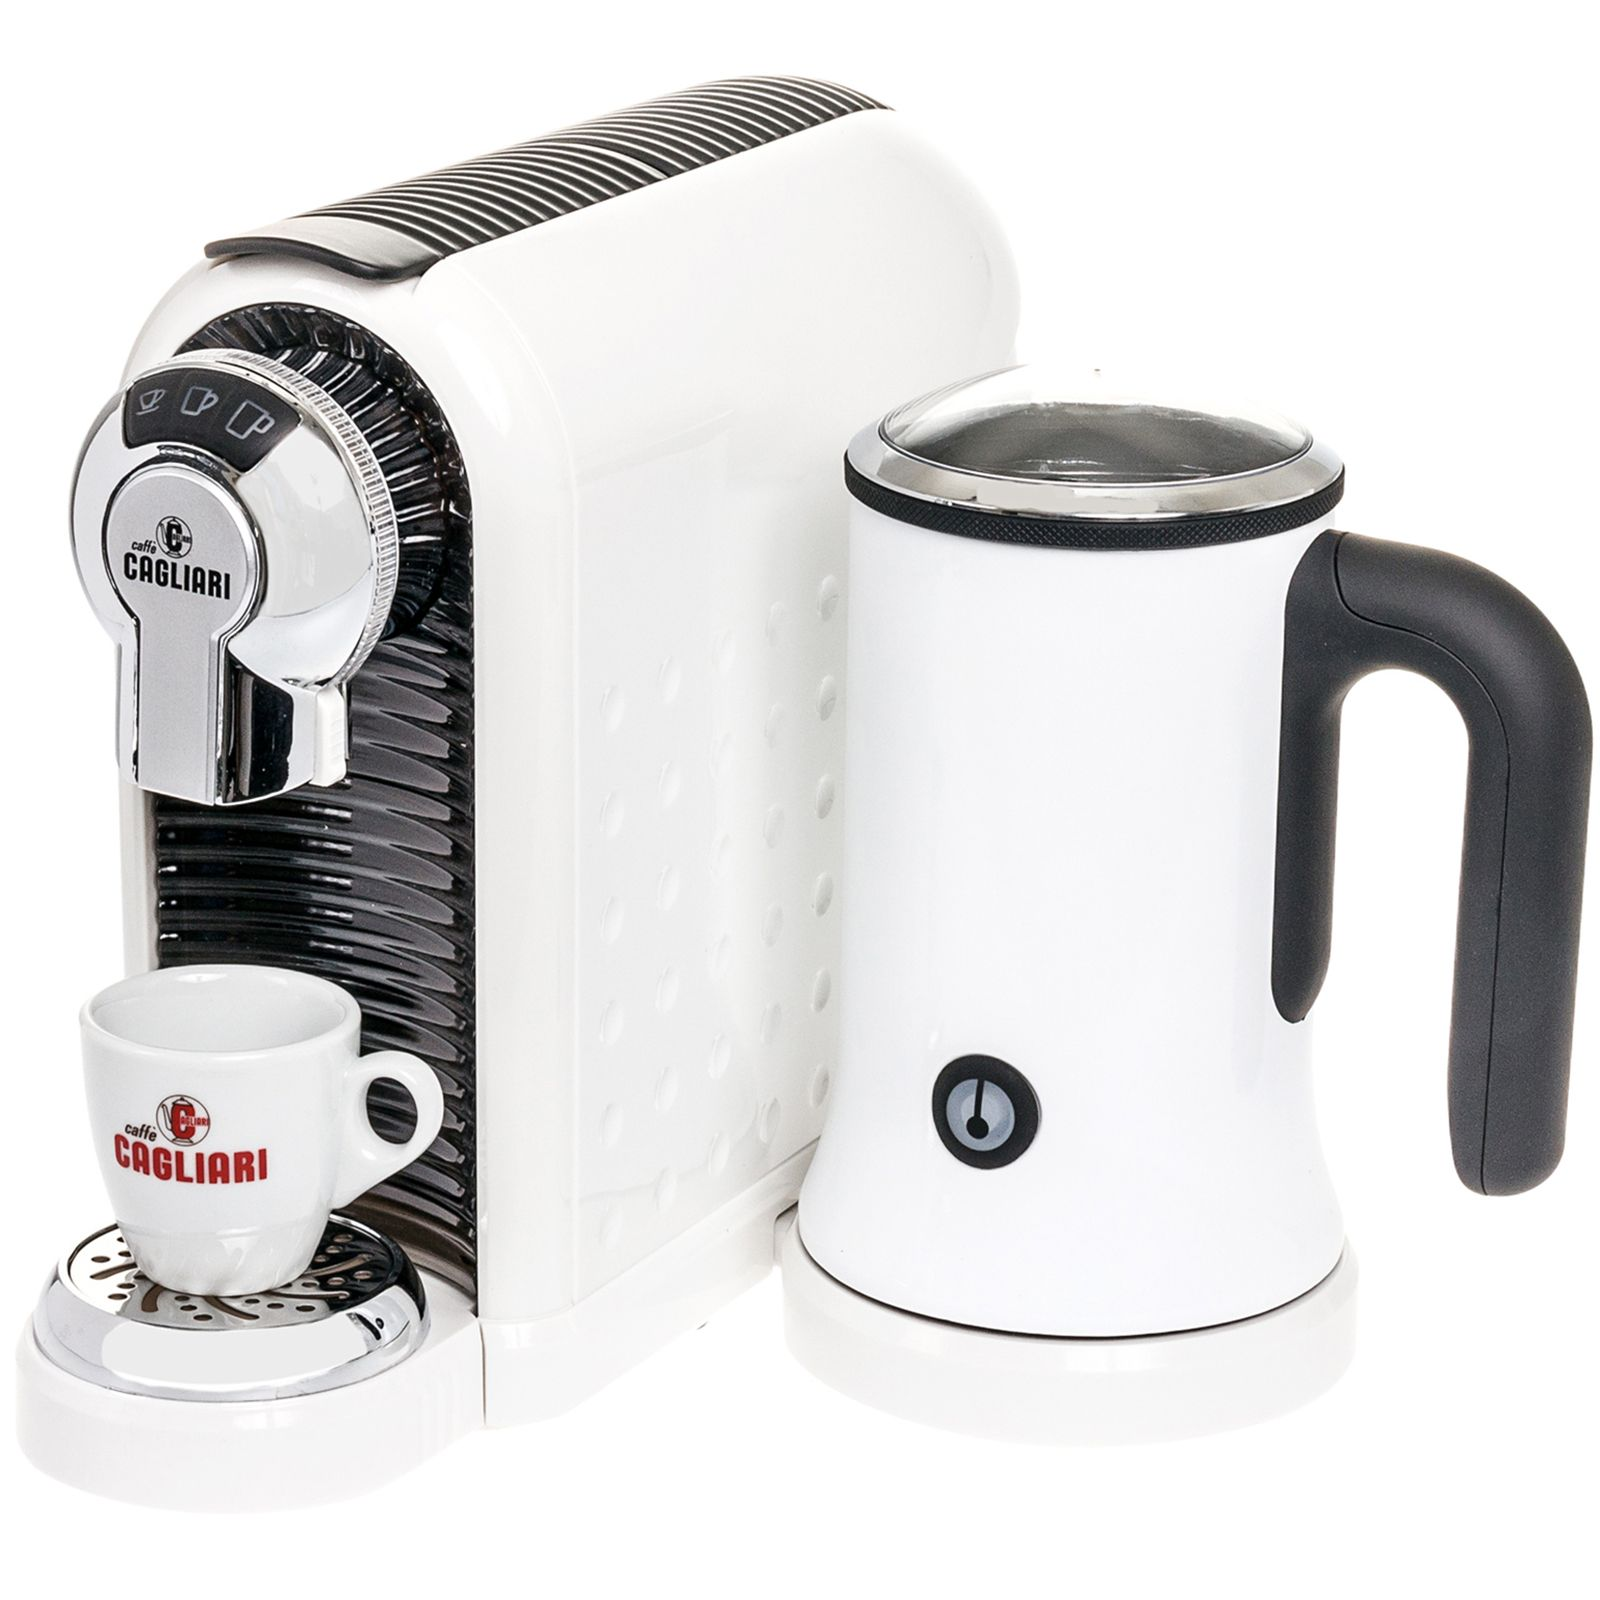 Print of Make your HomeMade Coffee with Espresso Machine